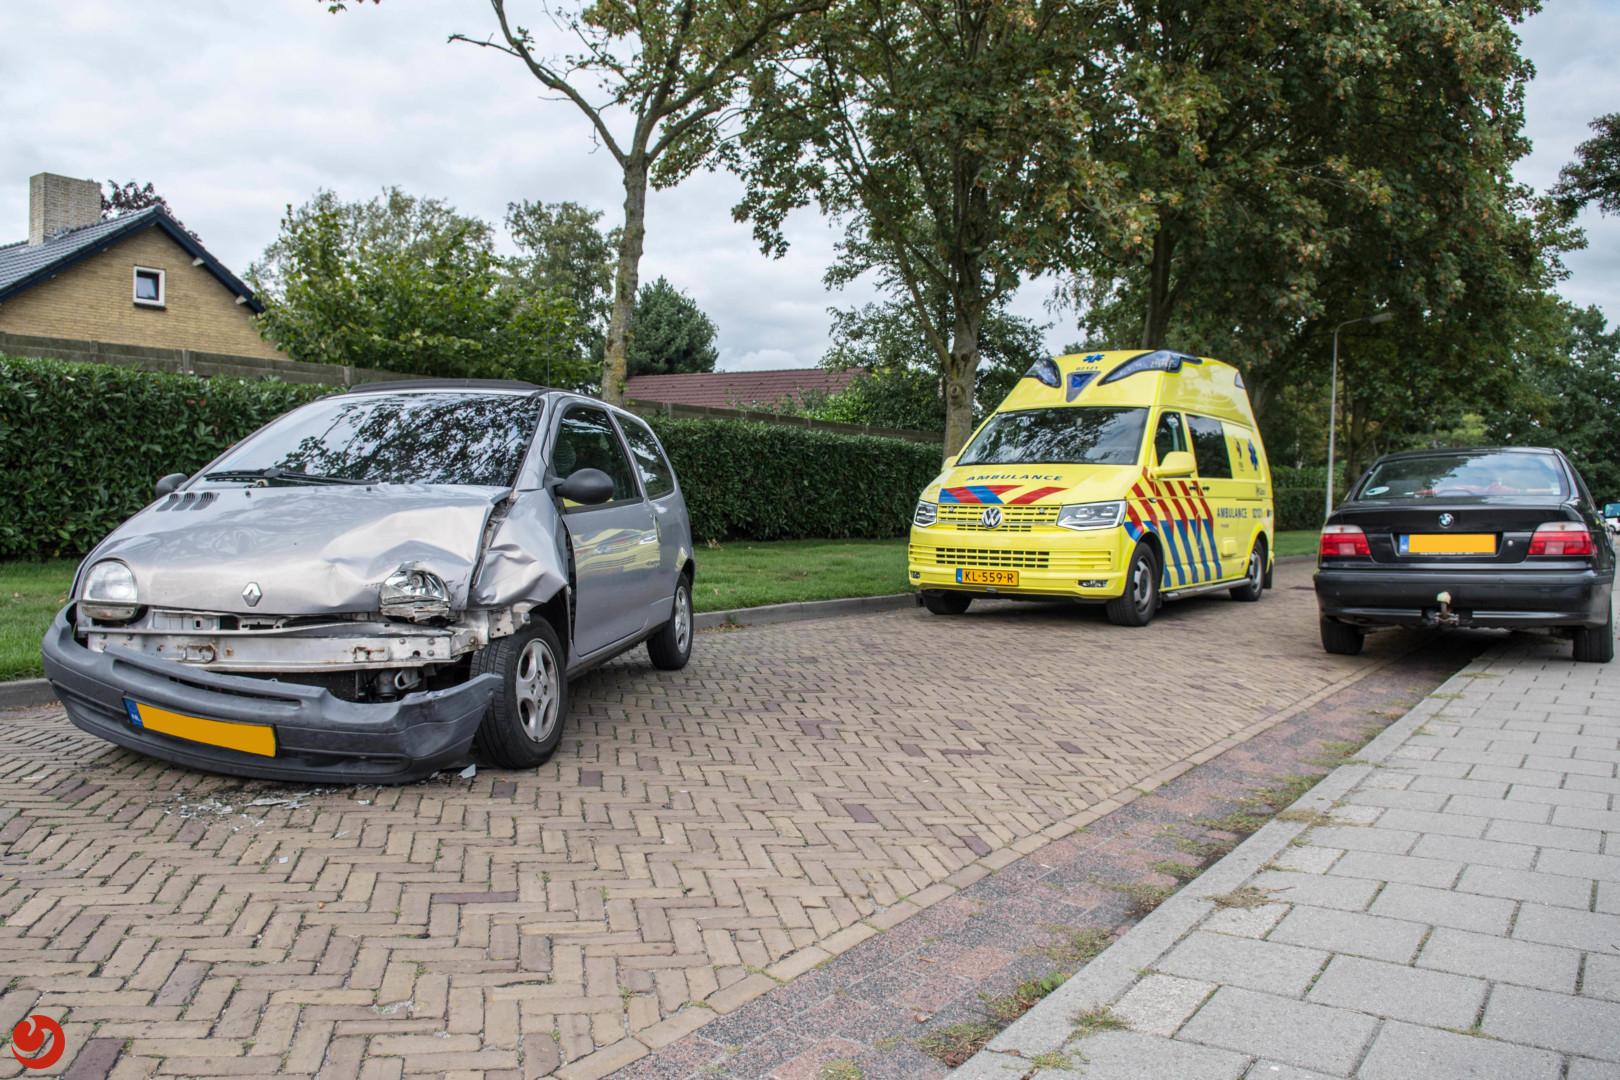 Automobiliste gewond na botsing bij kinderboerderij